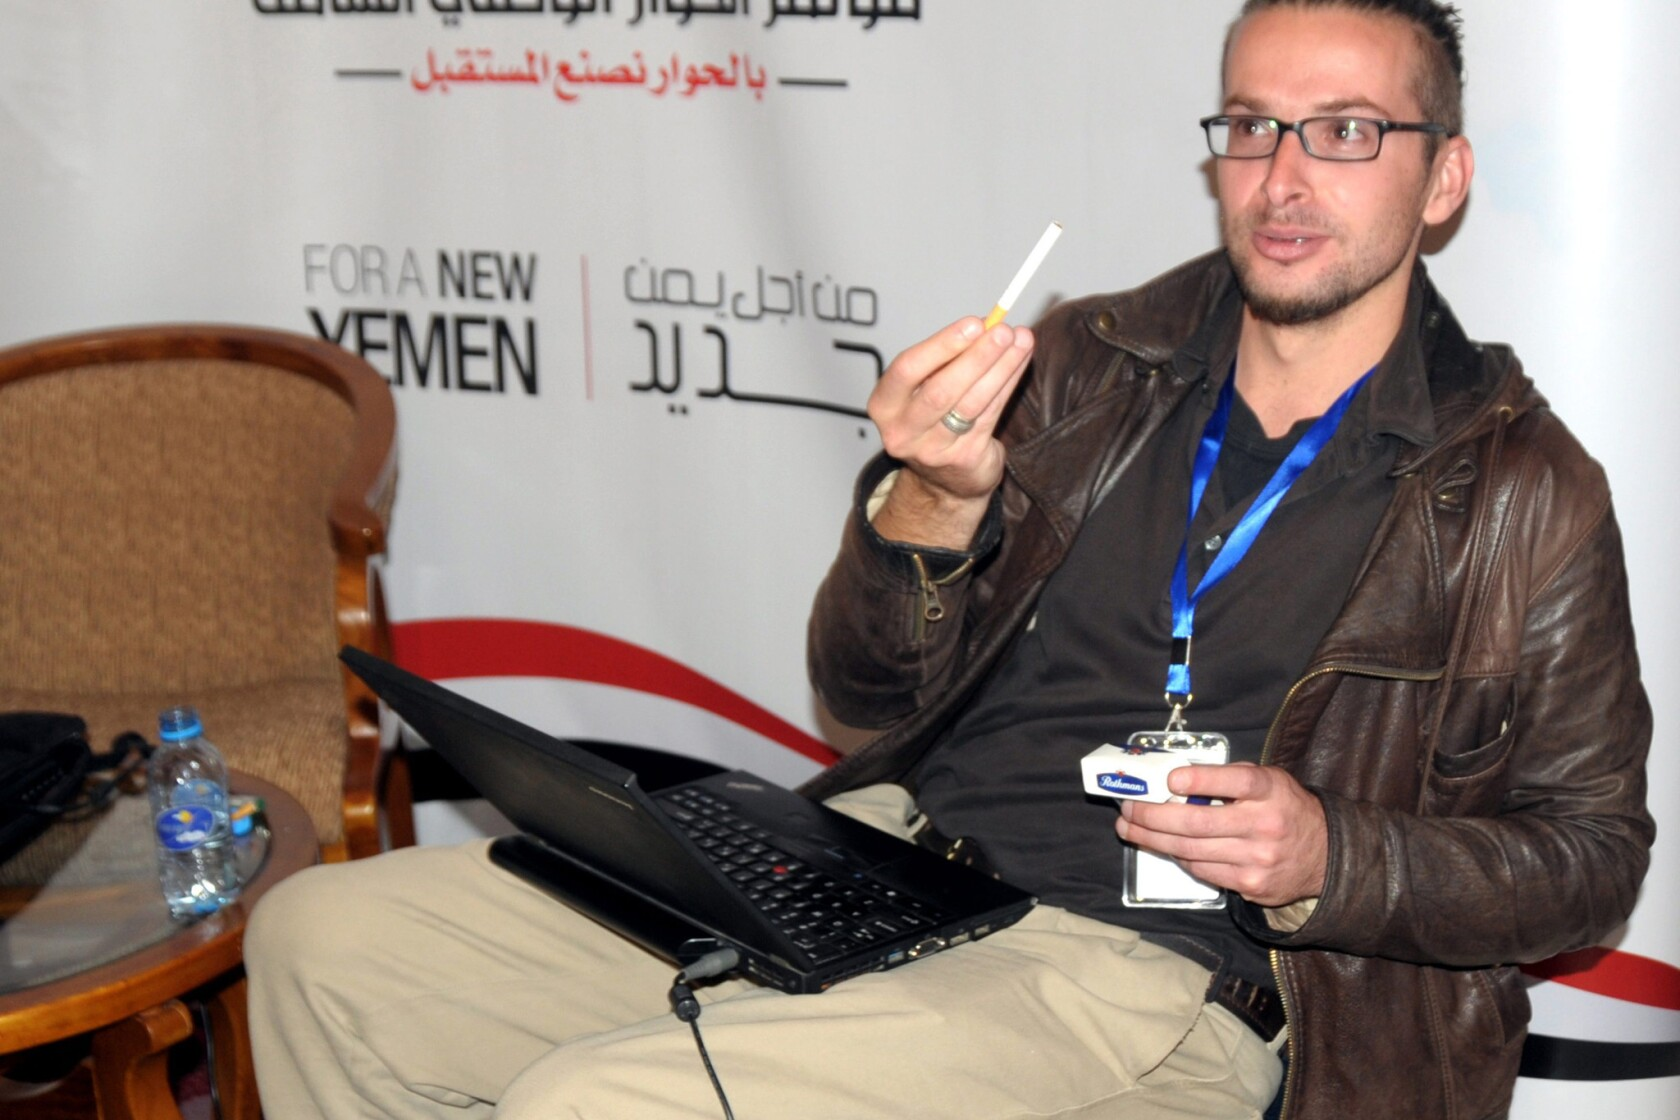 U.S. hostage Luke Somers killed in Yemen during rescue attempt